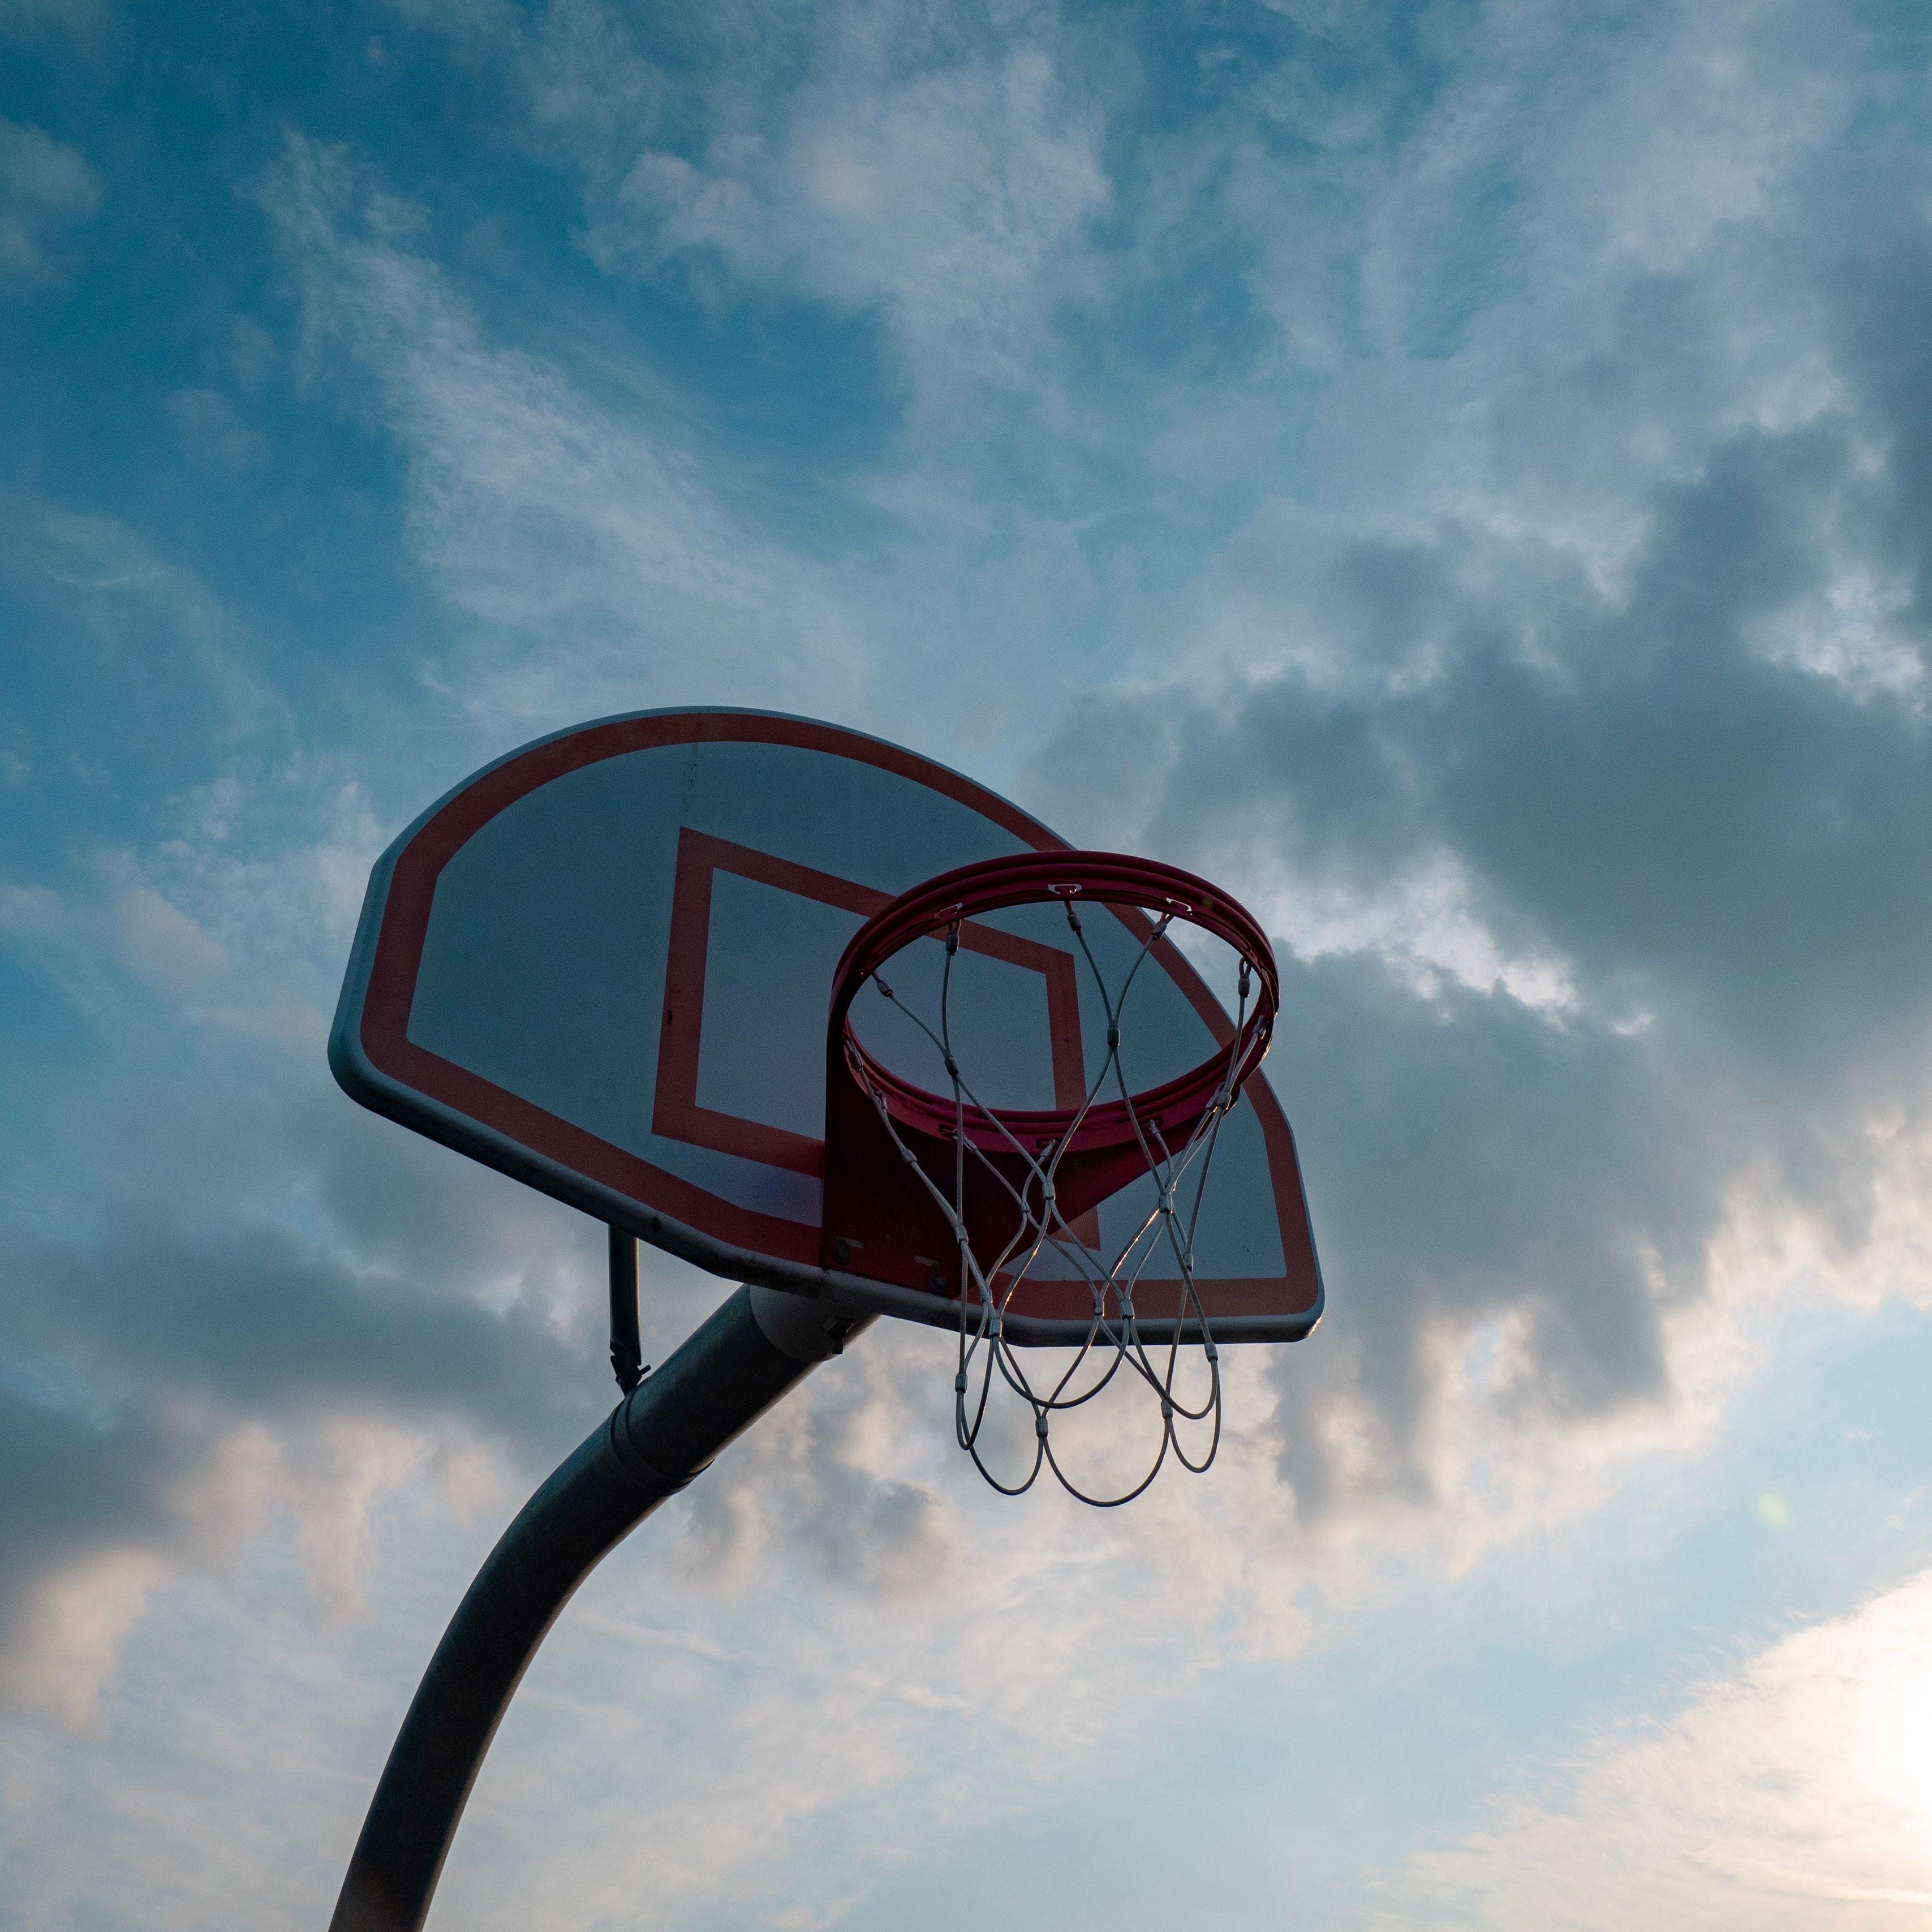 Basketball Hoop Wallpapers Top Free Basketball Hoop Backgrounds